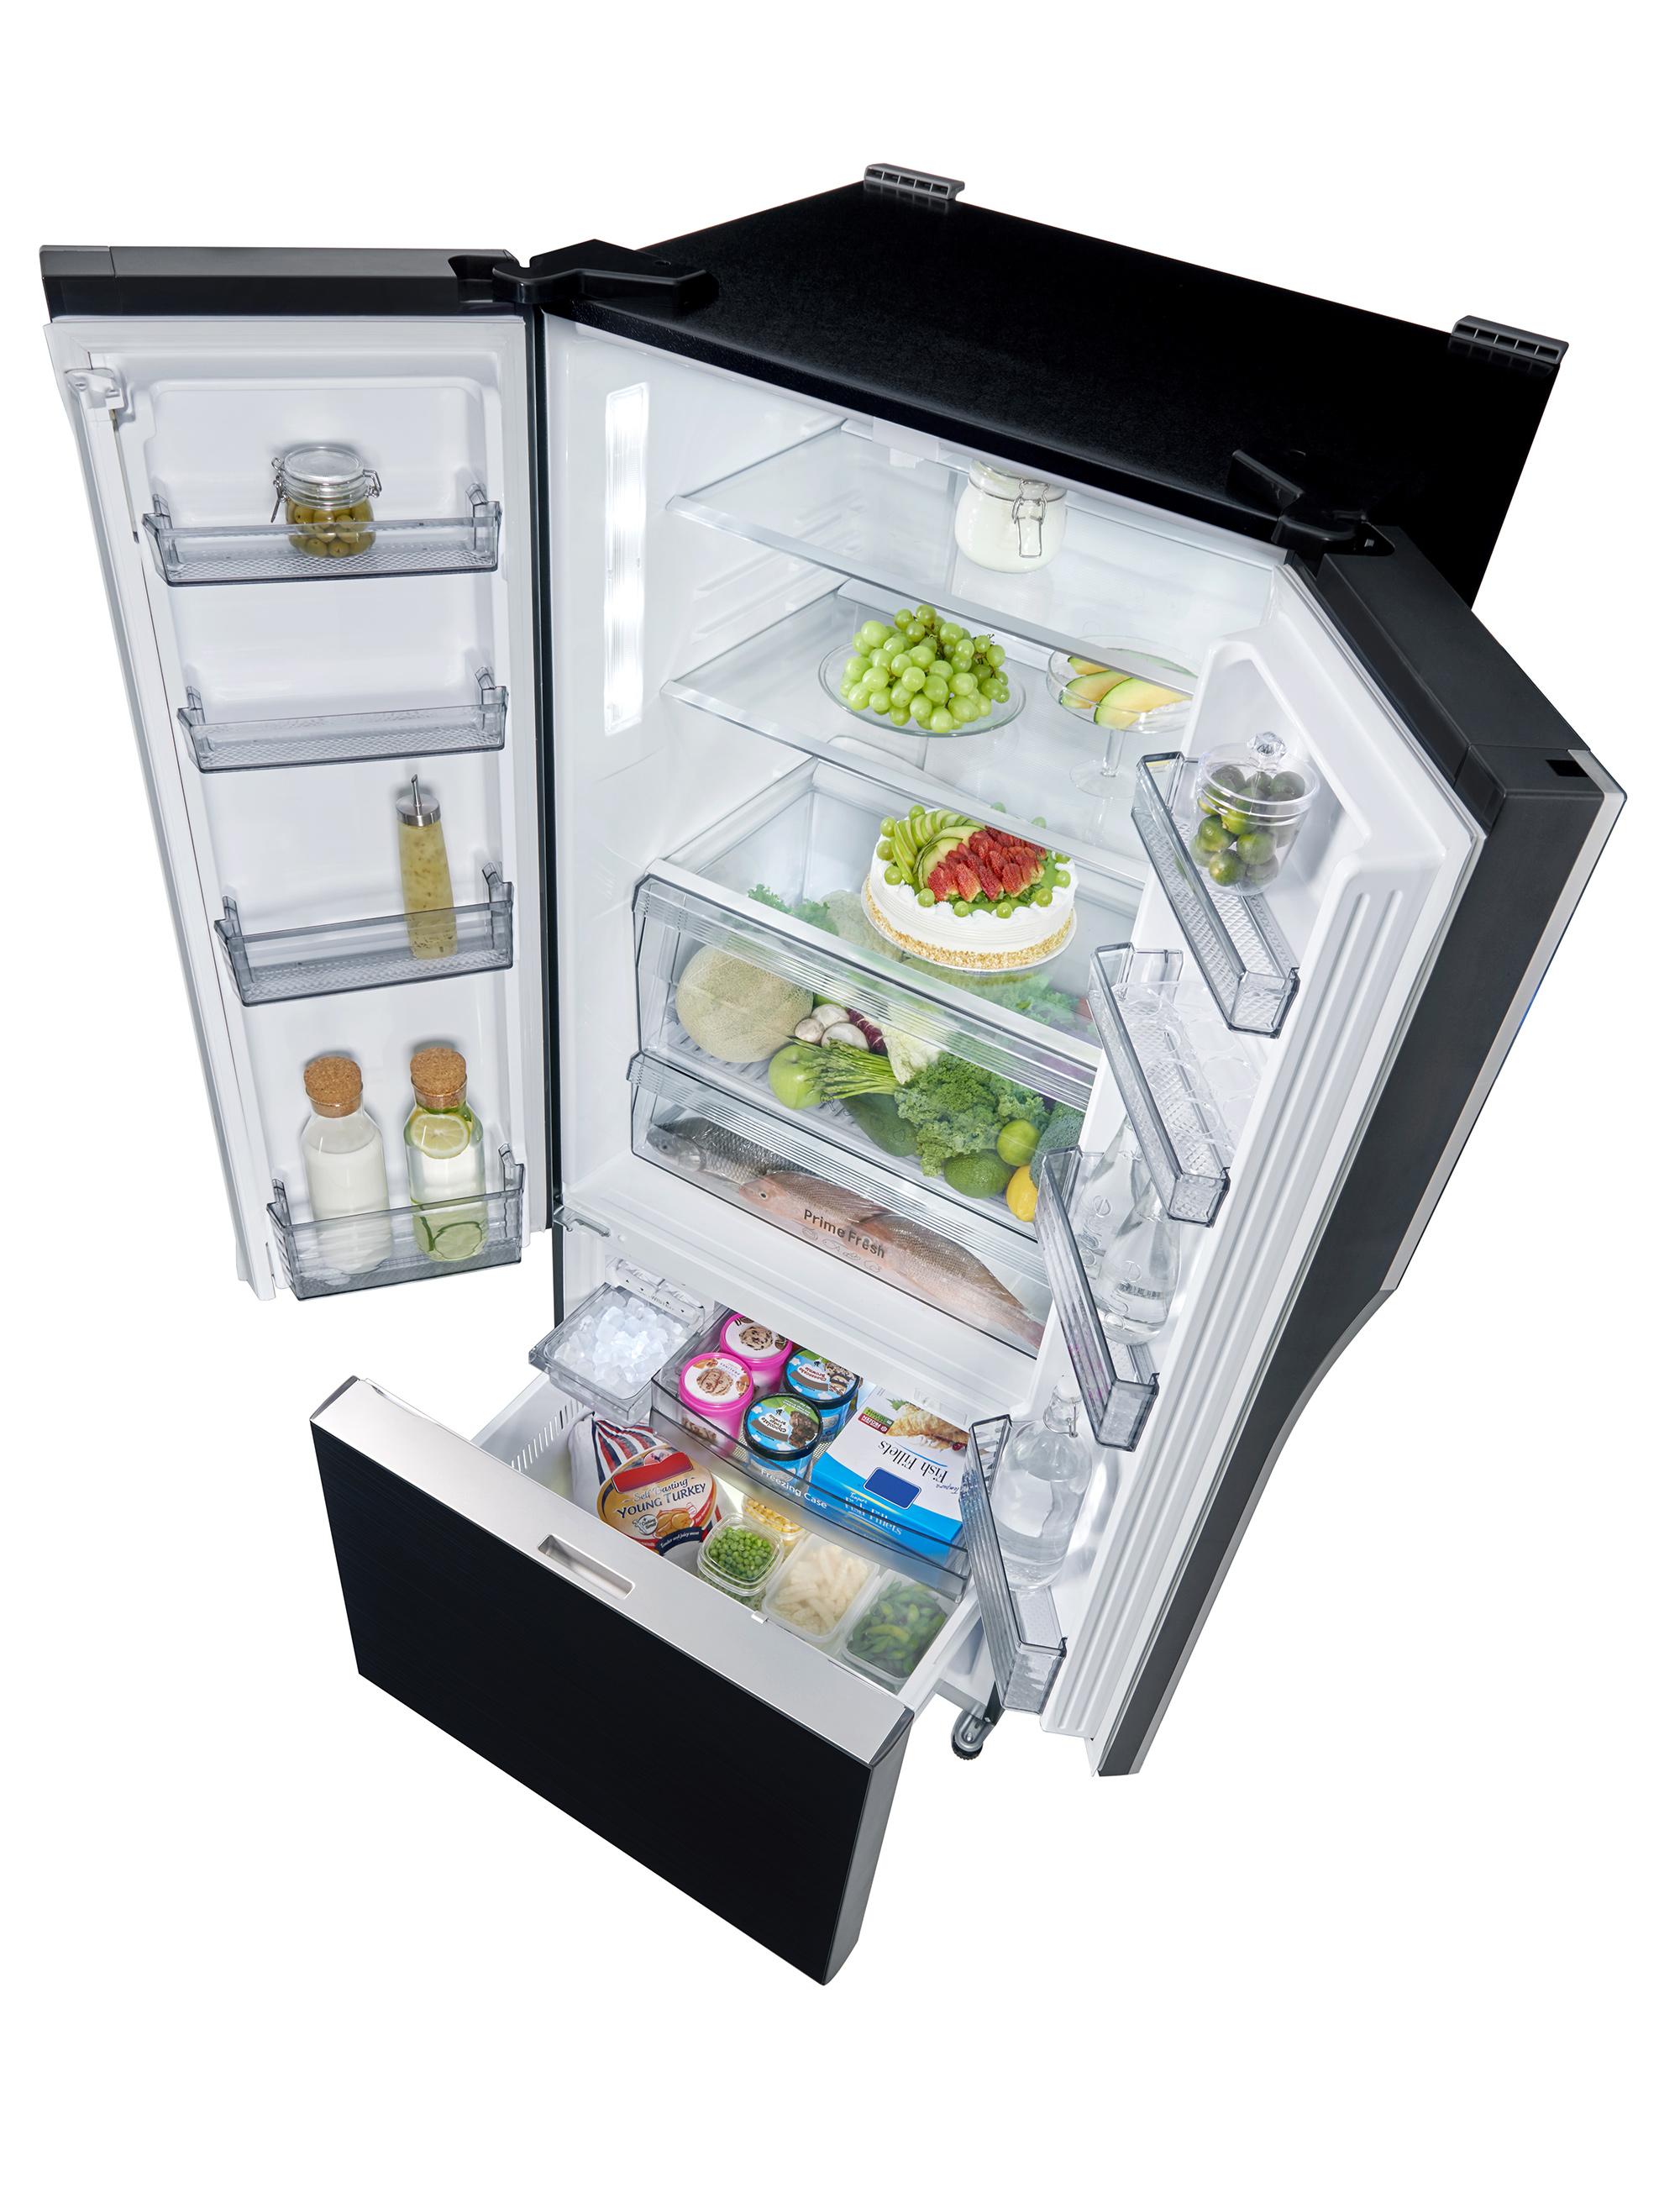 Panasonic NR CY55B French Door Refrigerator 2 Panasonic Unveils New French Door Refrigerators